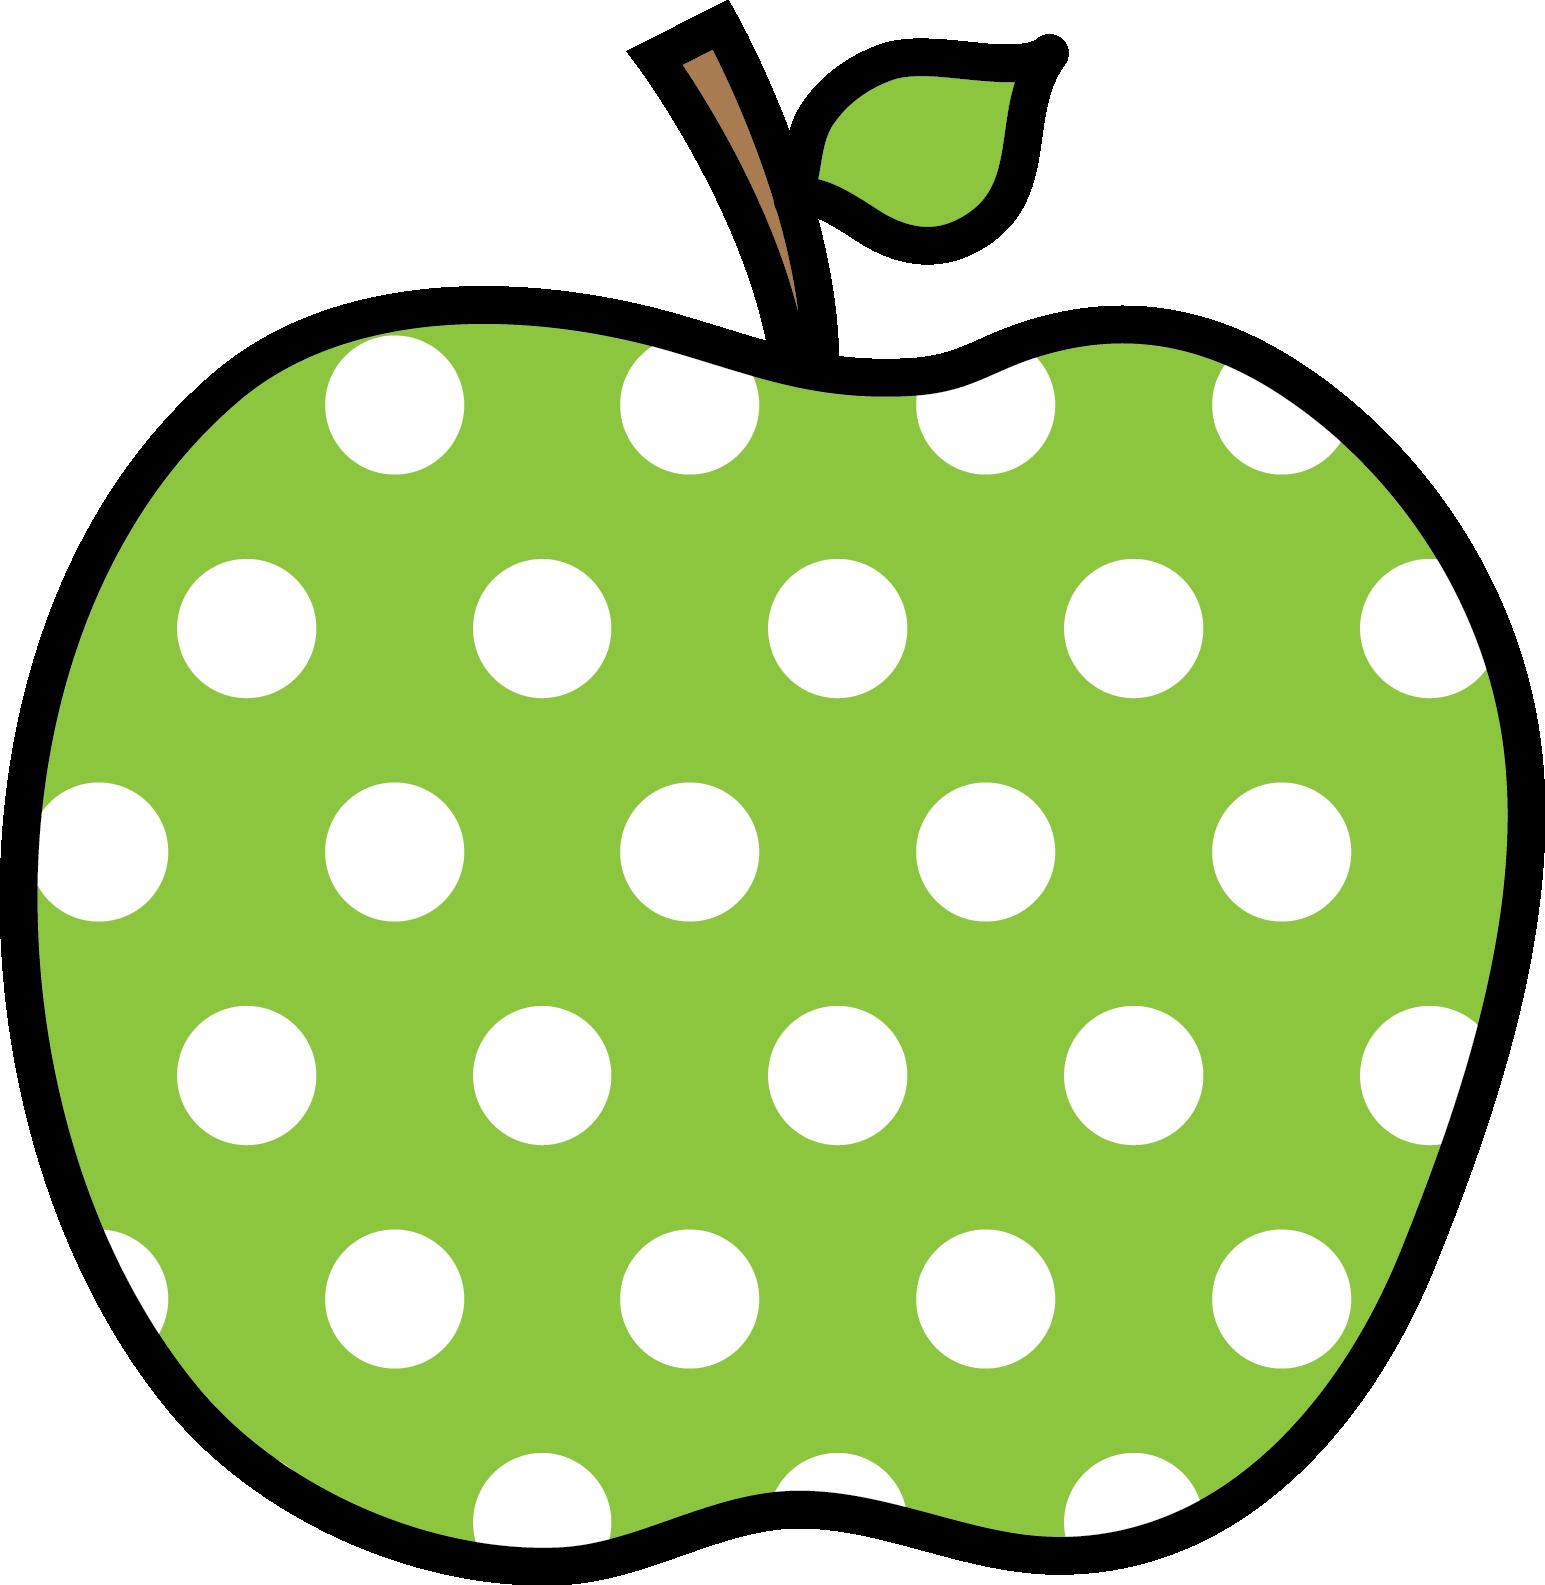 Dots clipart transparent apple ✿*UY clipart polka de dot